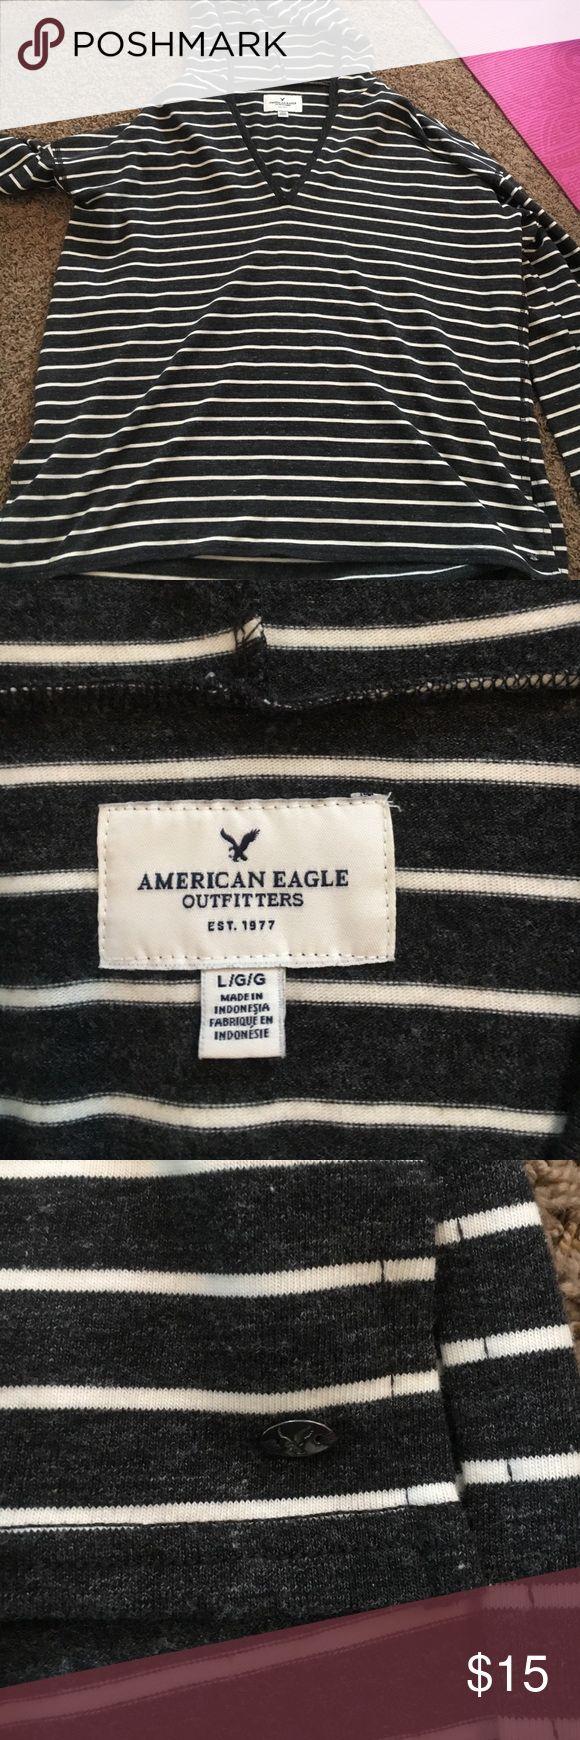 American Eagle sweatshirt American Eagle sweatshirt Jackets & Coats Blazers